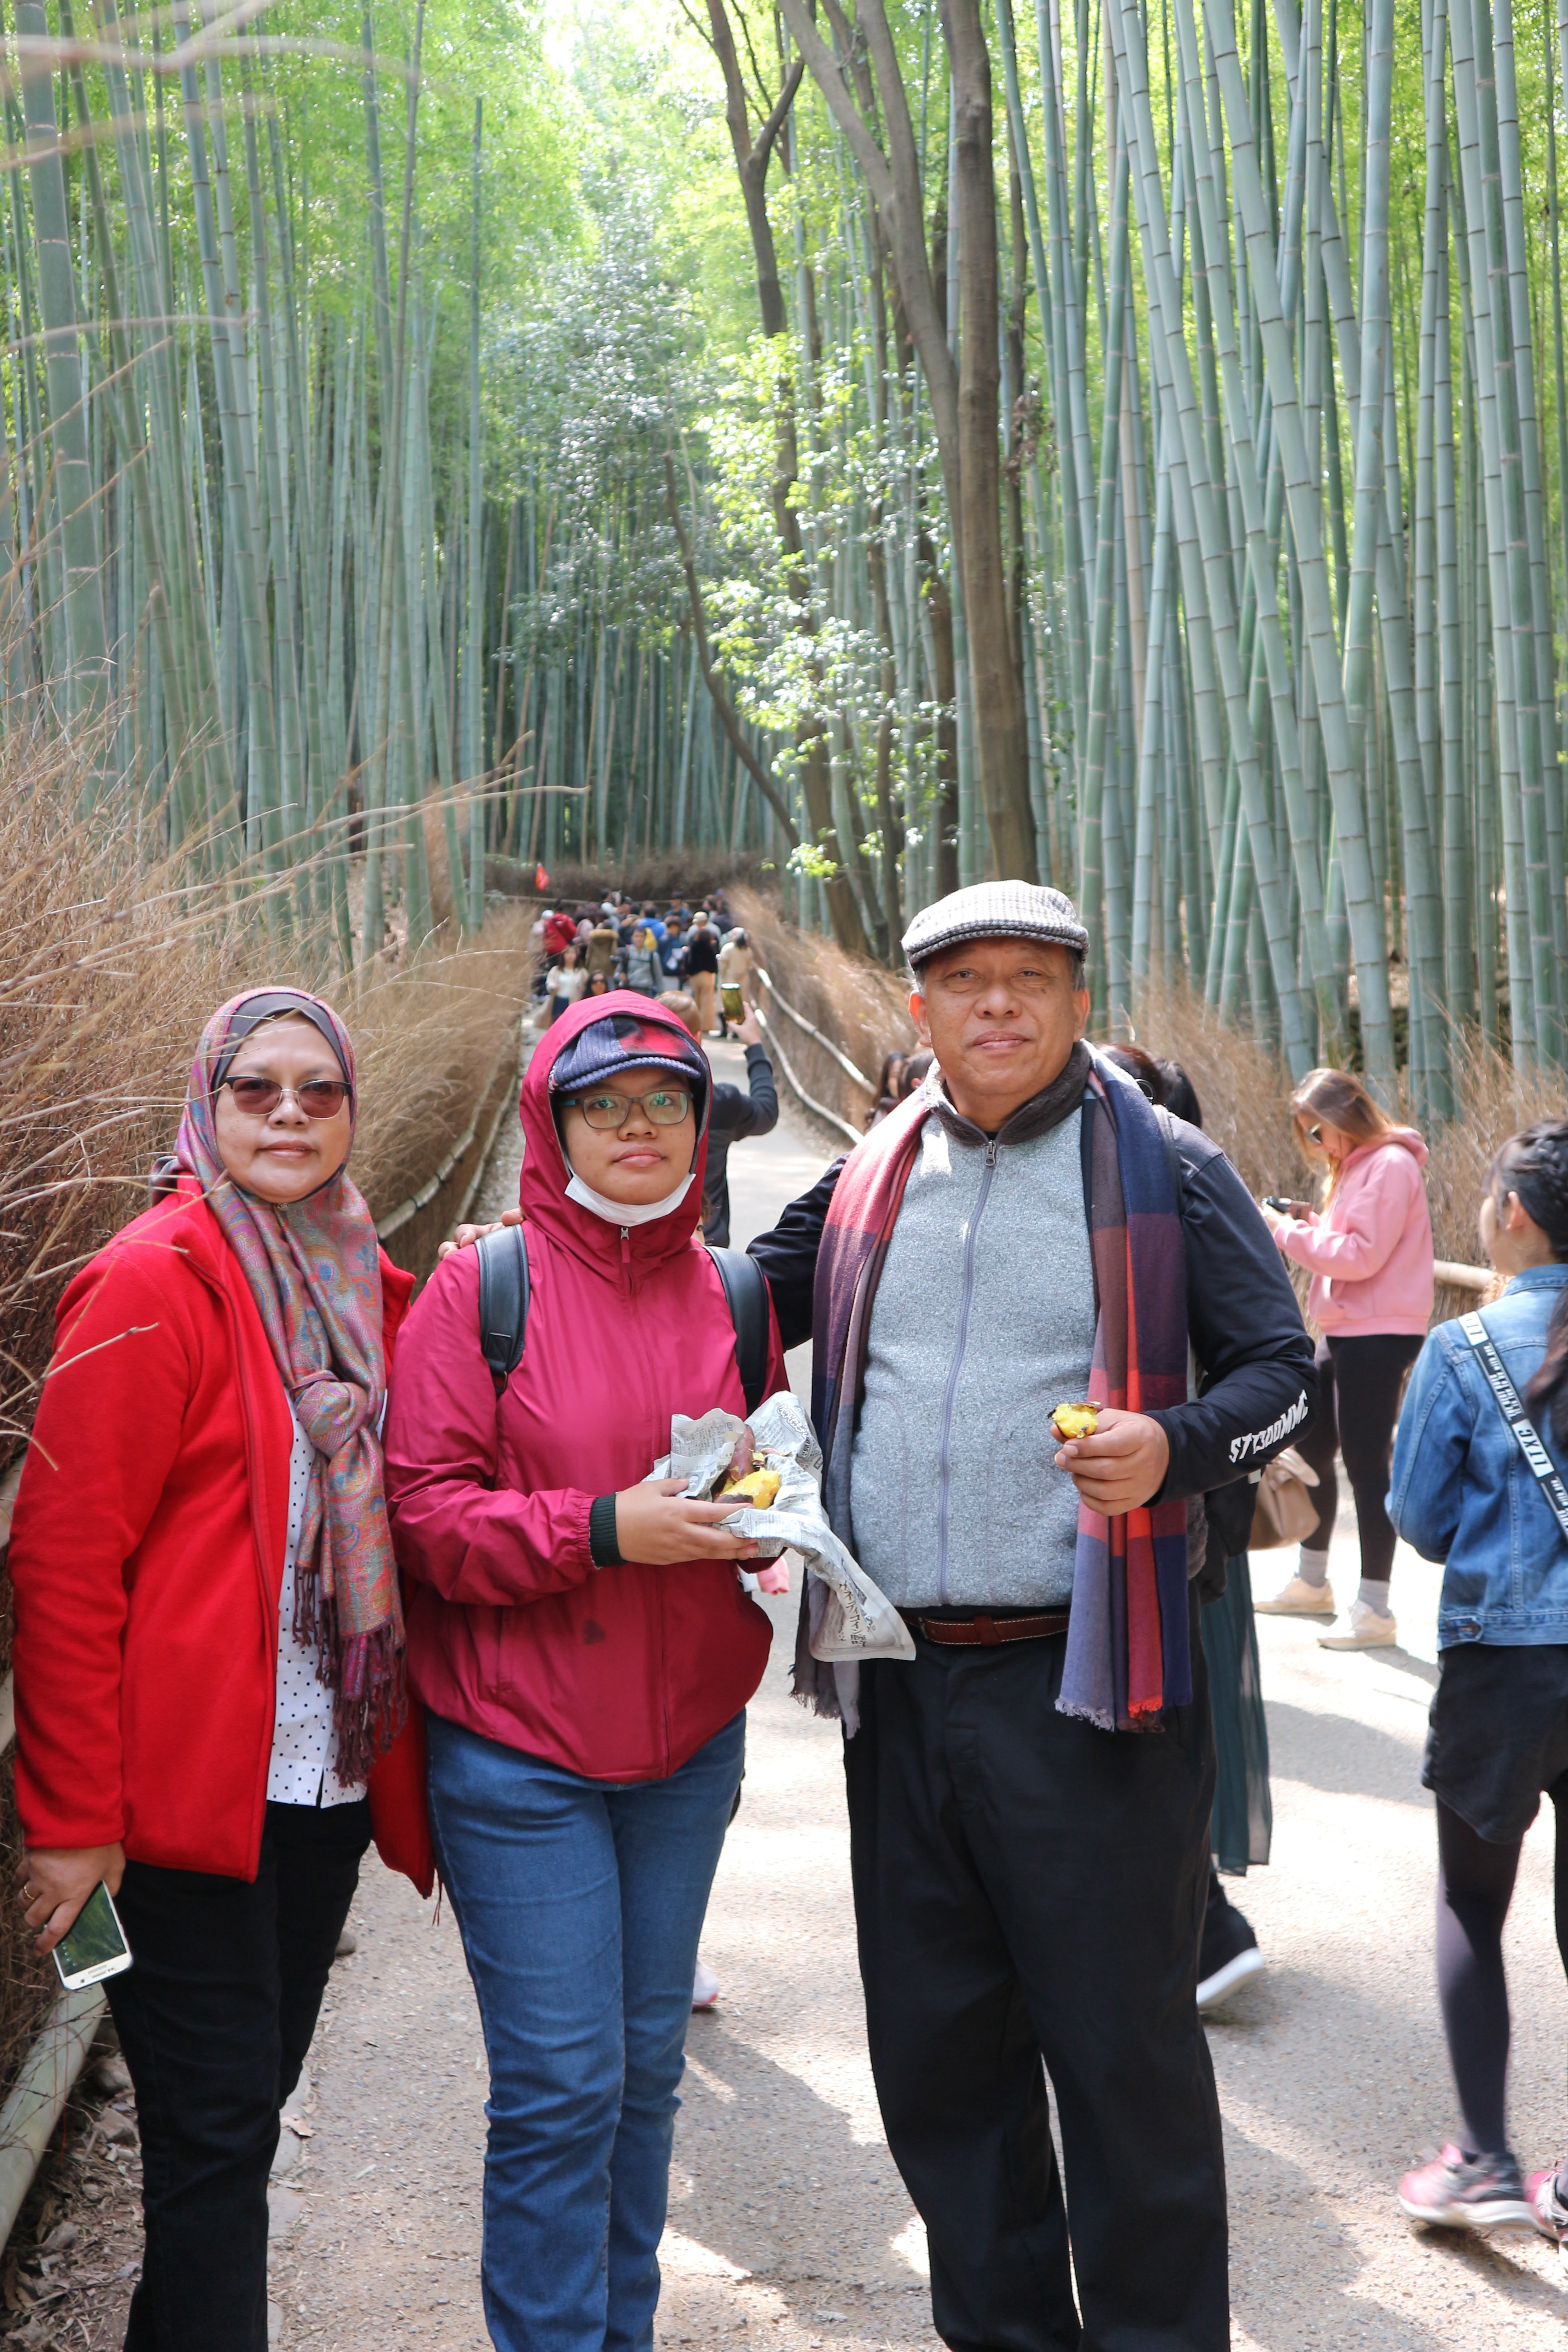 Arashiyama - Sagano Bamboo Groves (1 of 2)